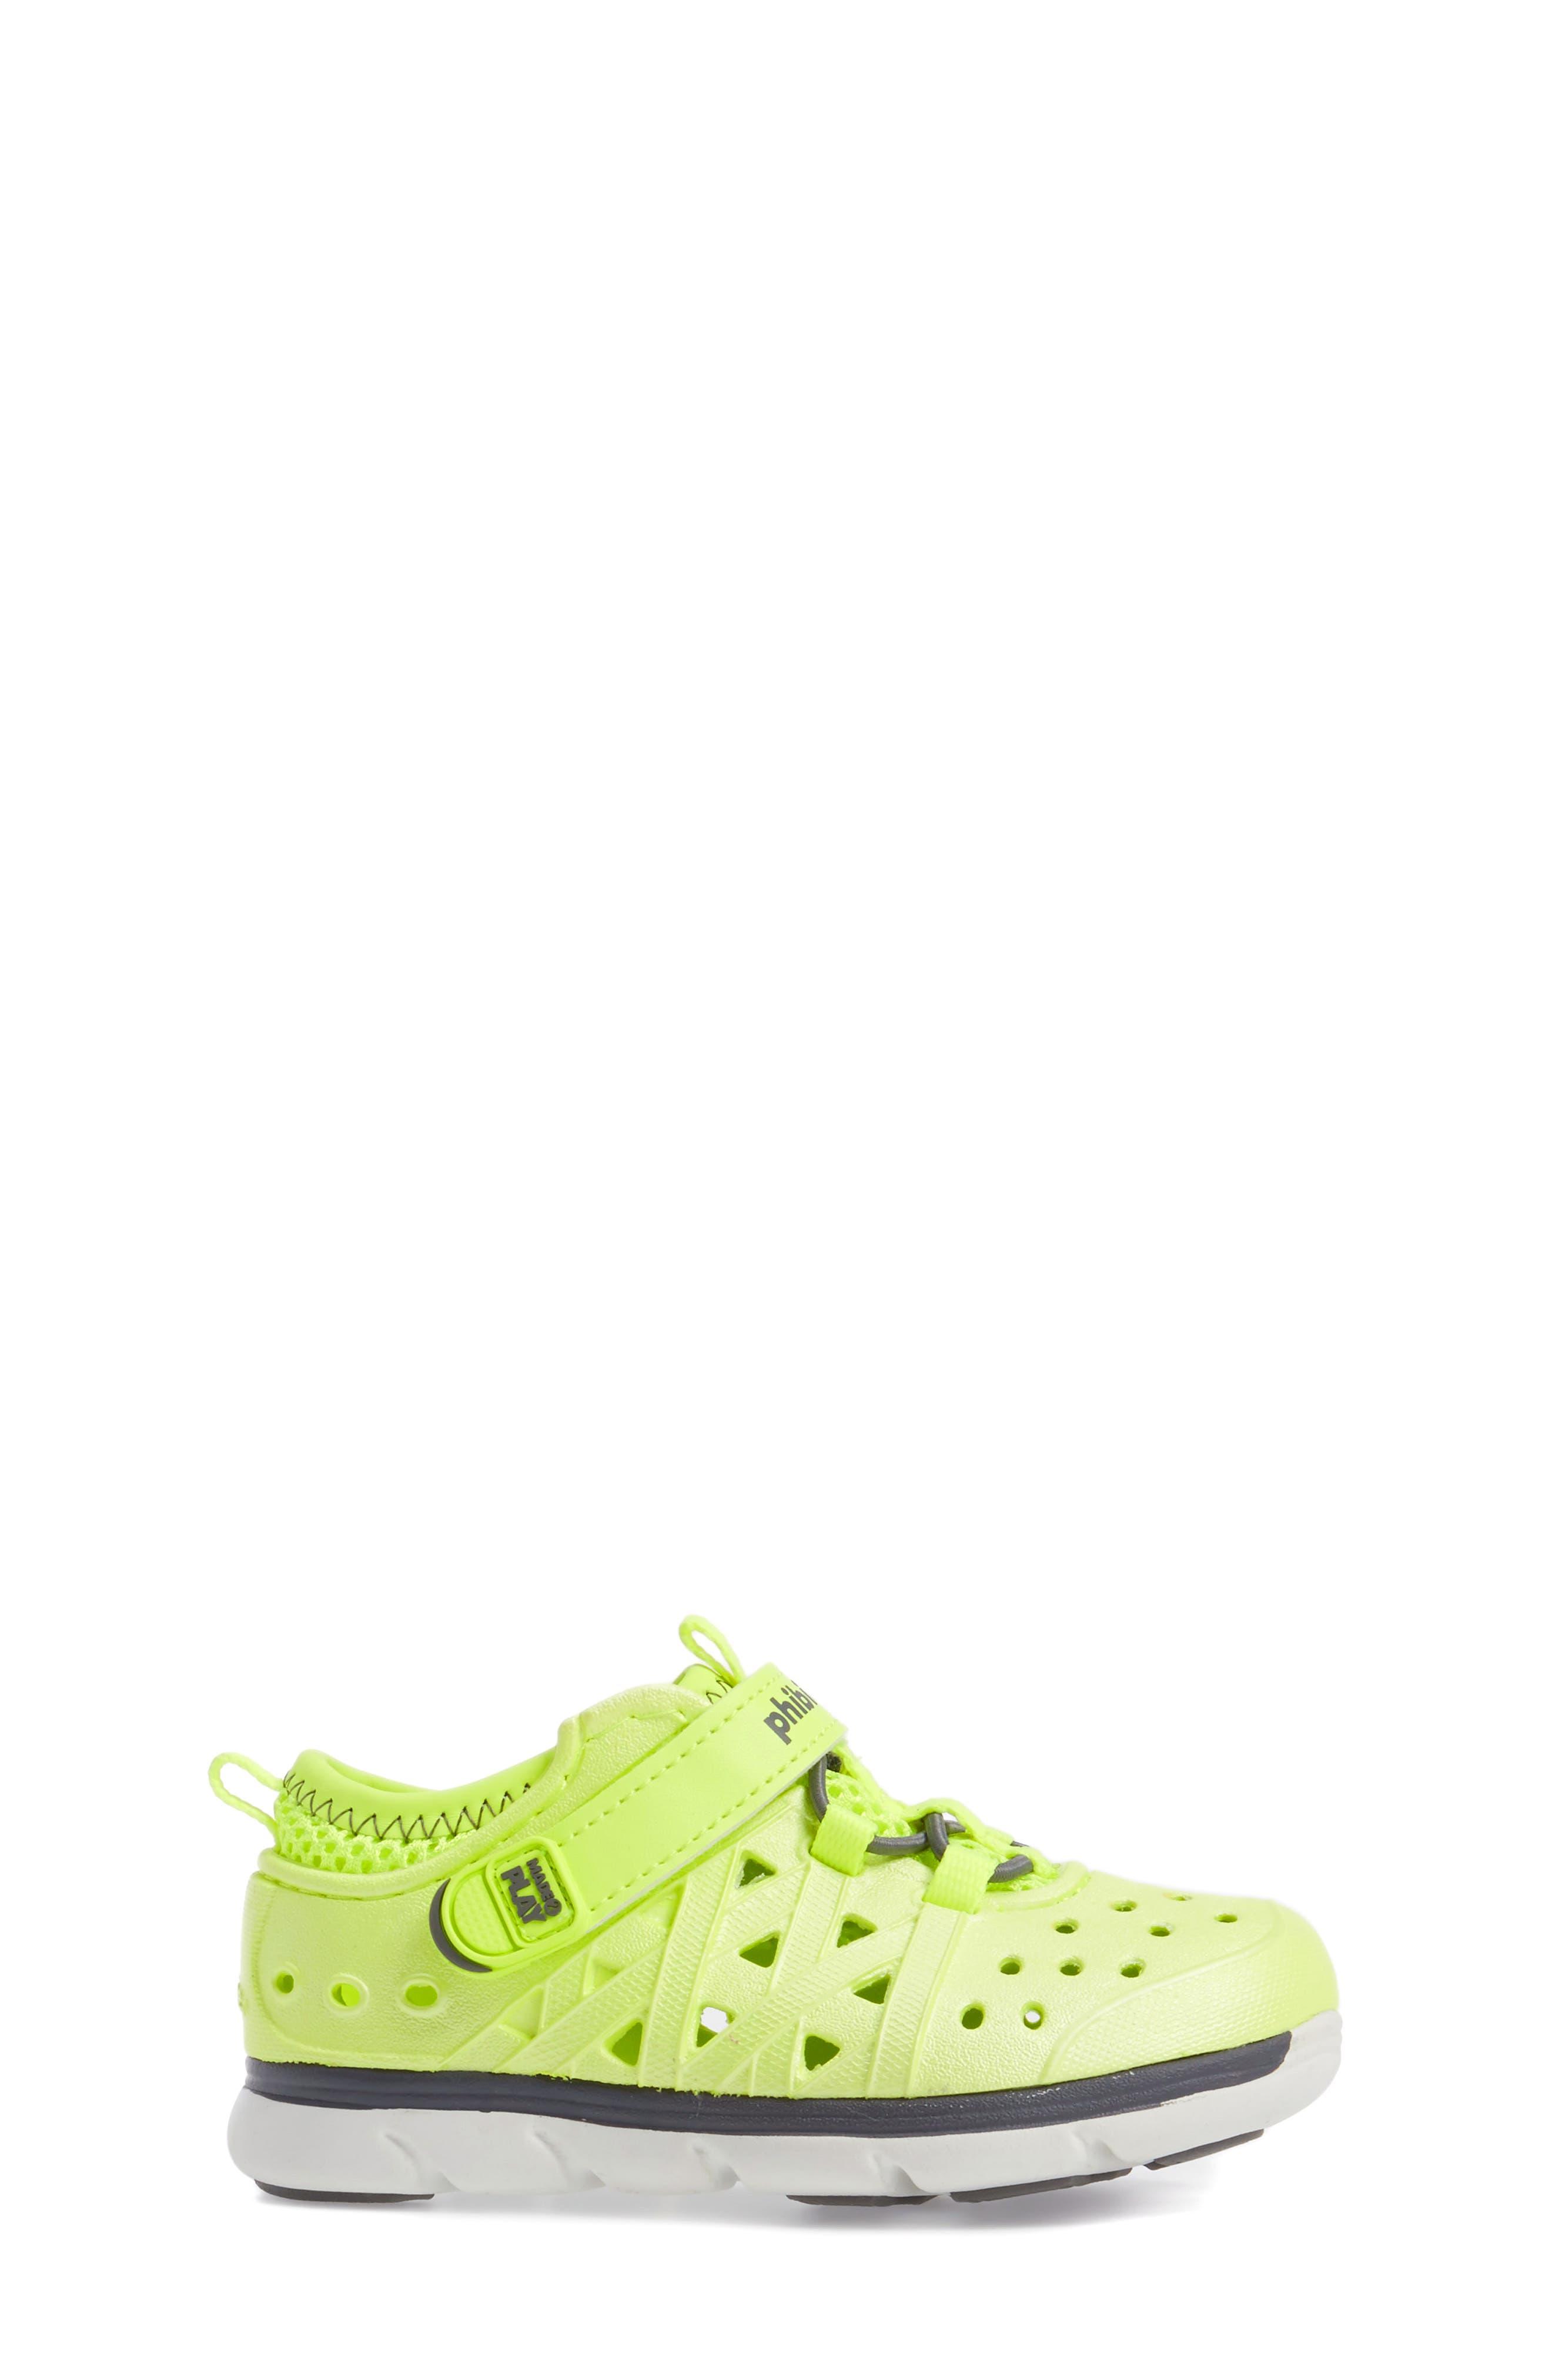 Made2Play<sup>®</sup> Phibian Sneaker,                             Alternate thumbnail 3, color,                             Citron Metallic